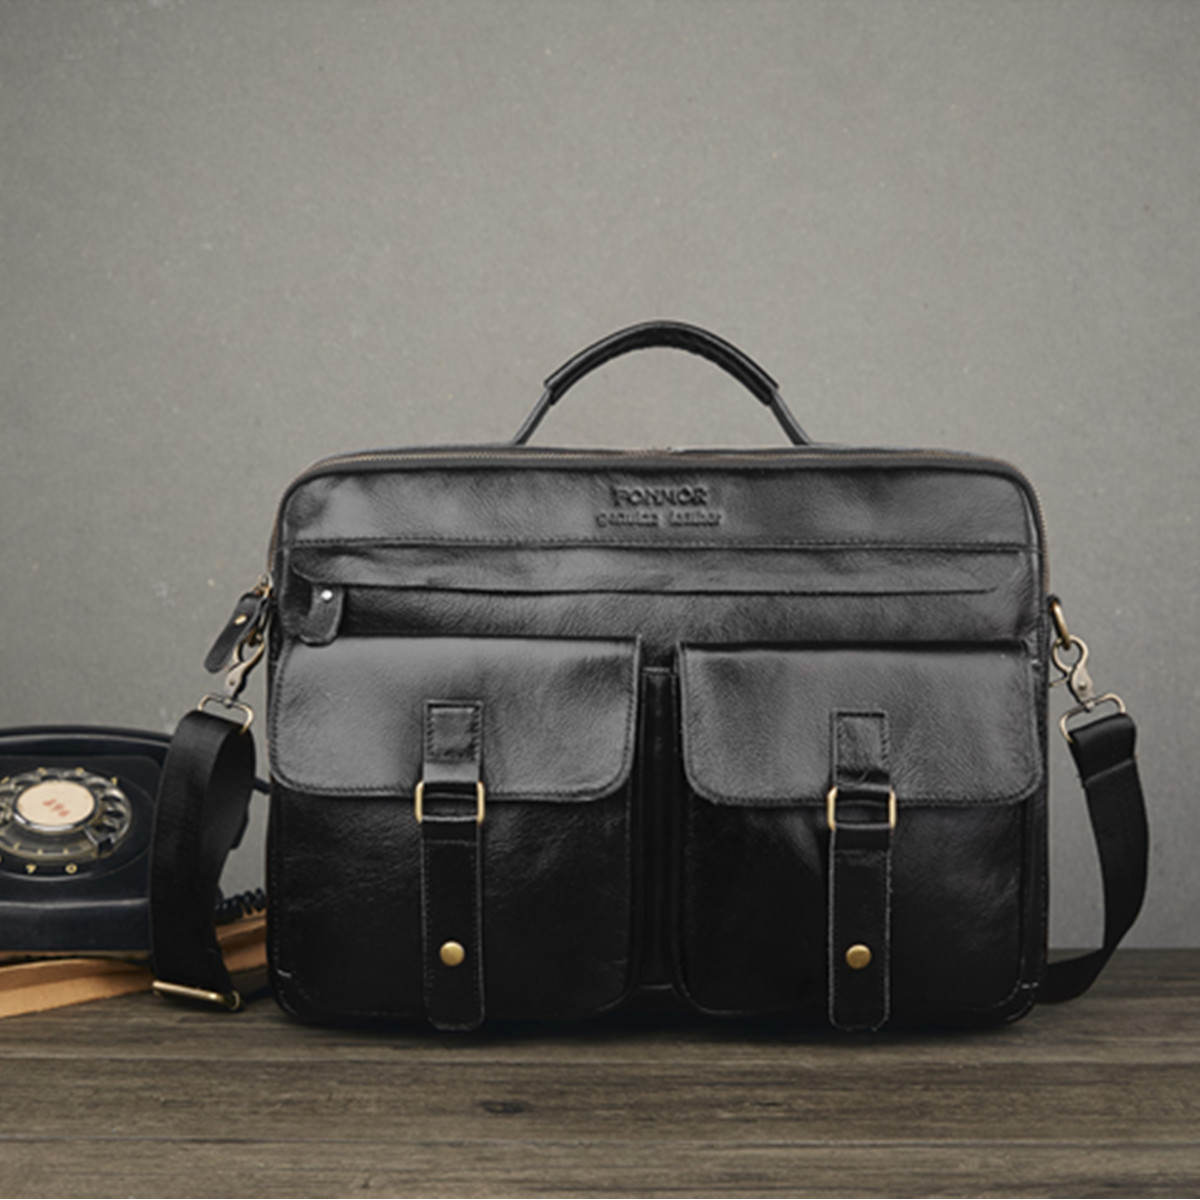 100% Top Layer Cowhide Men Leather Briefcase Business Handbag Messenger Bags Male Vintage Shoulder Bag Men's Large Laptop Bags